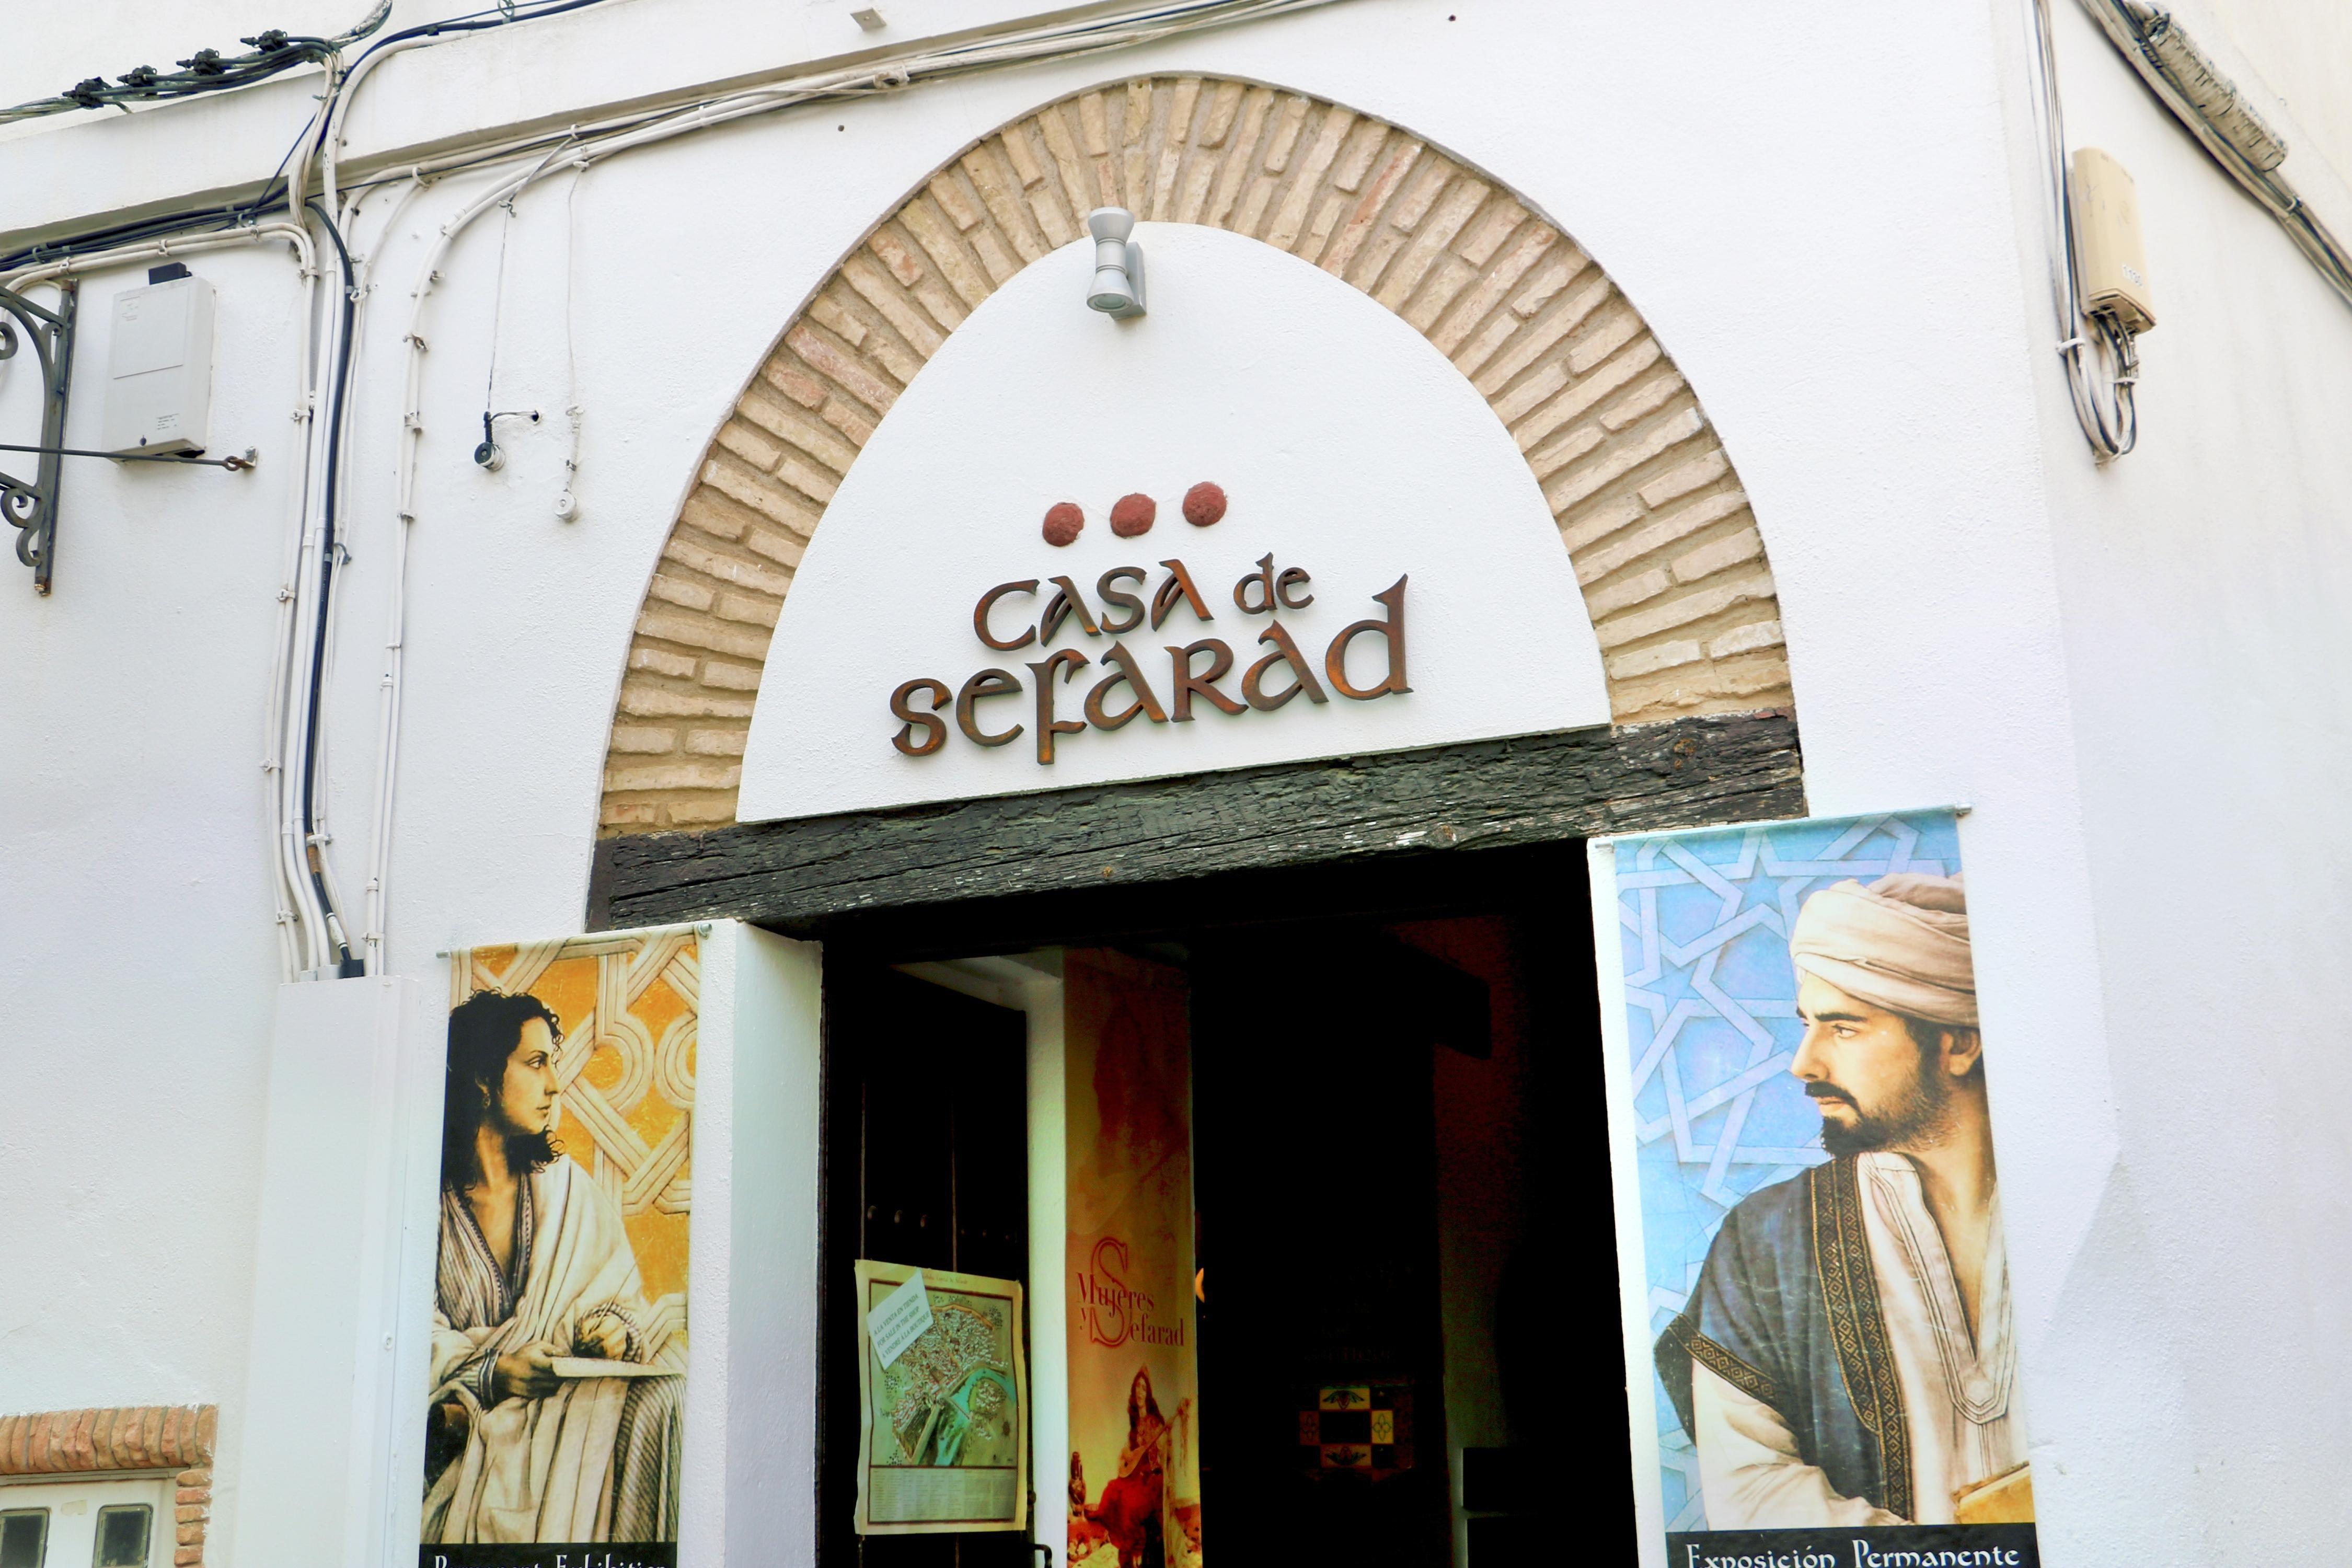 Casa de Sefarad